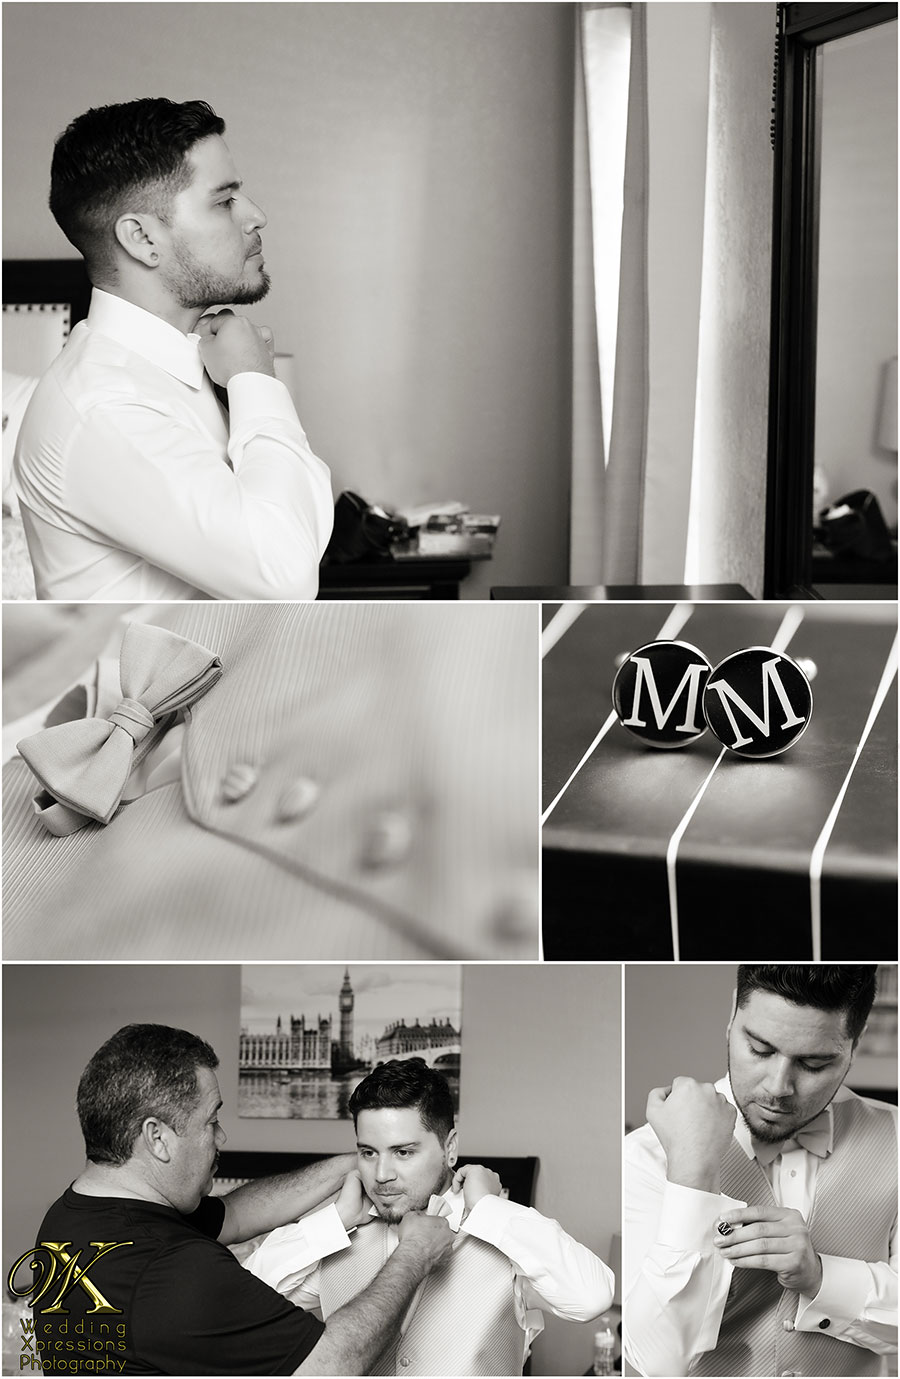 wedding photography of groom getting ready